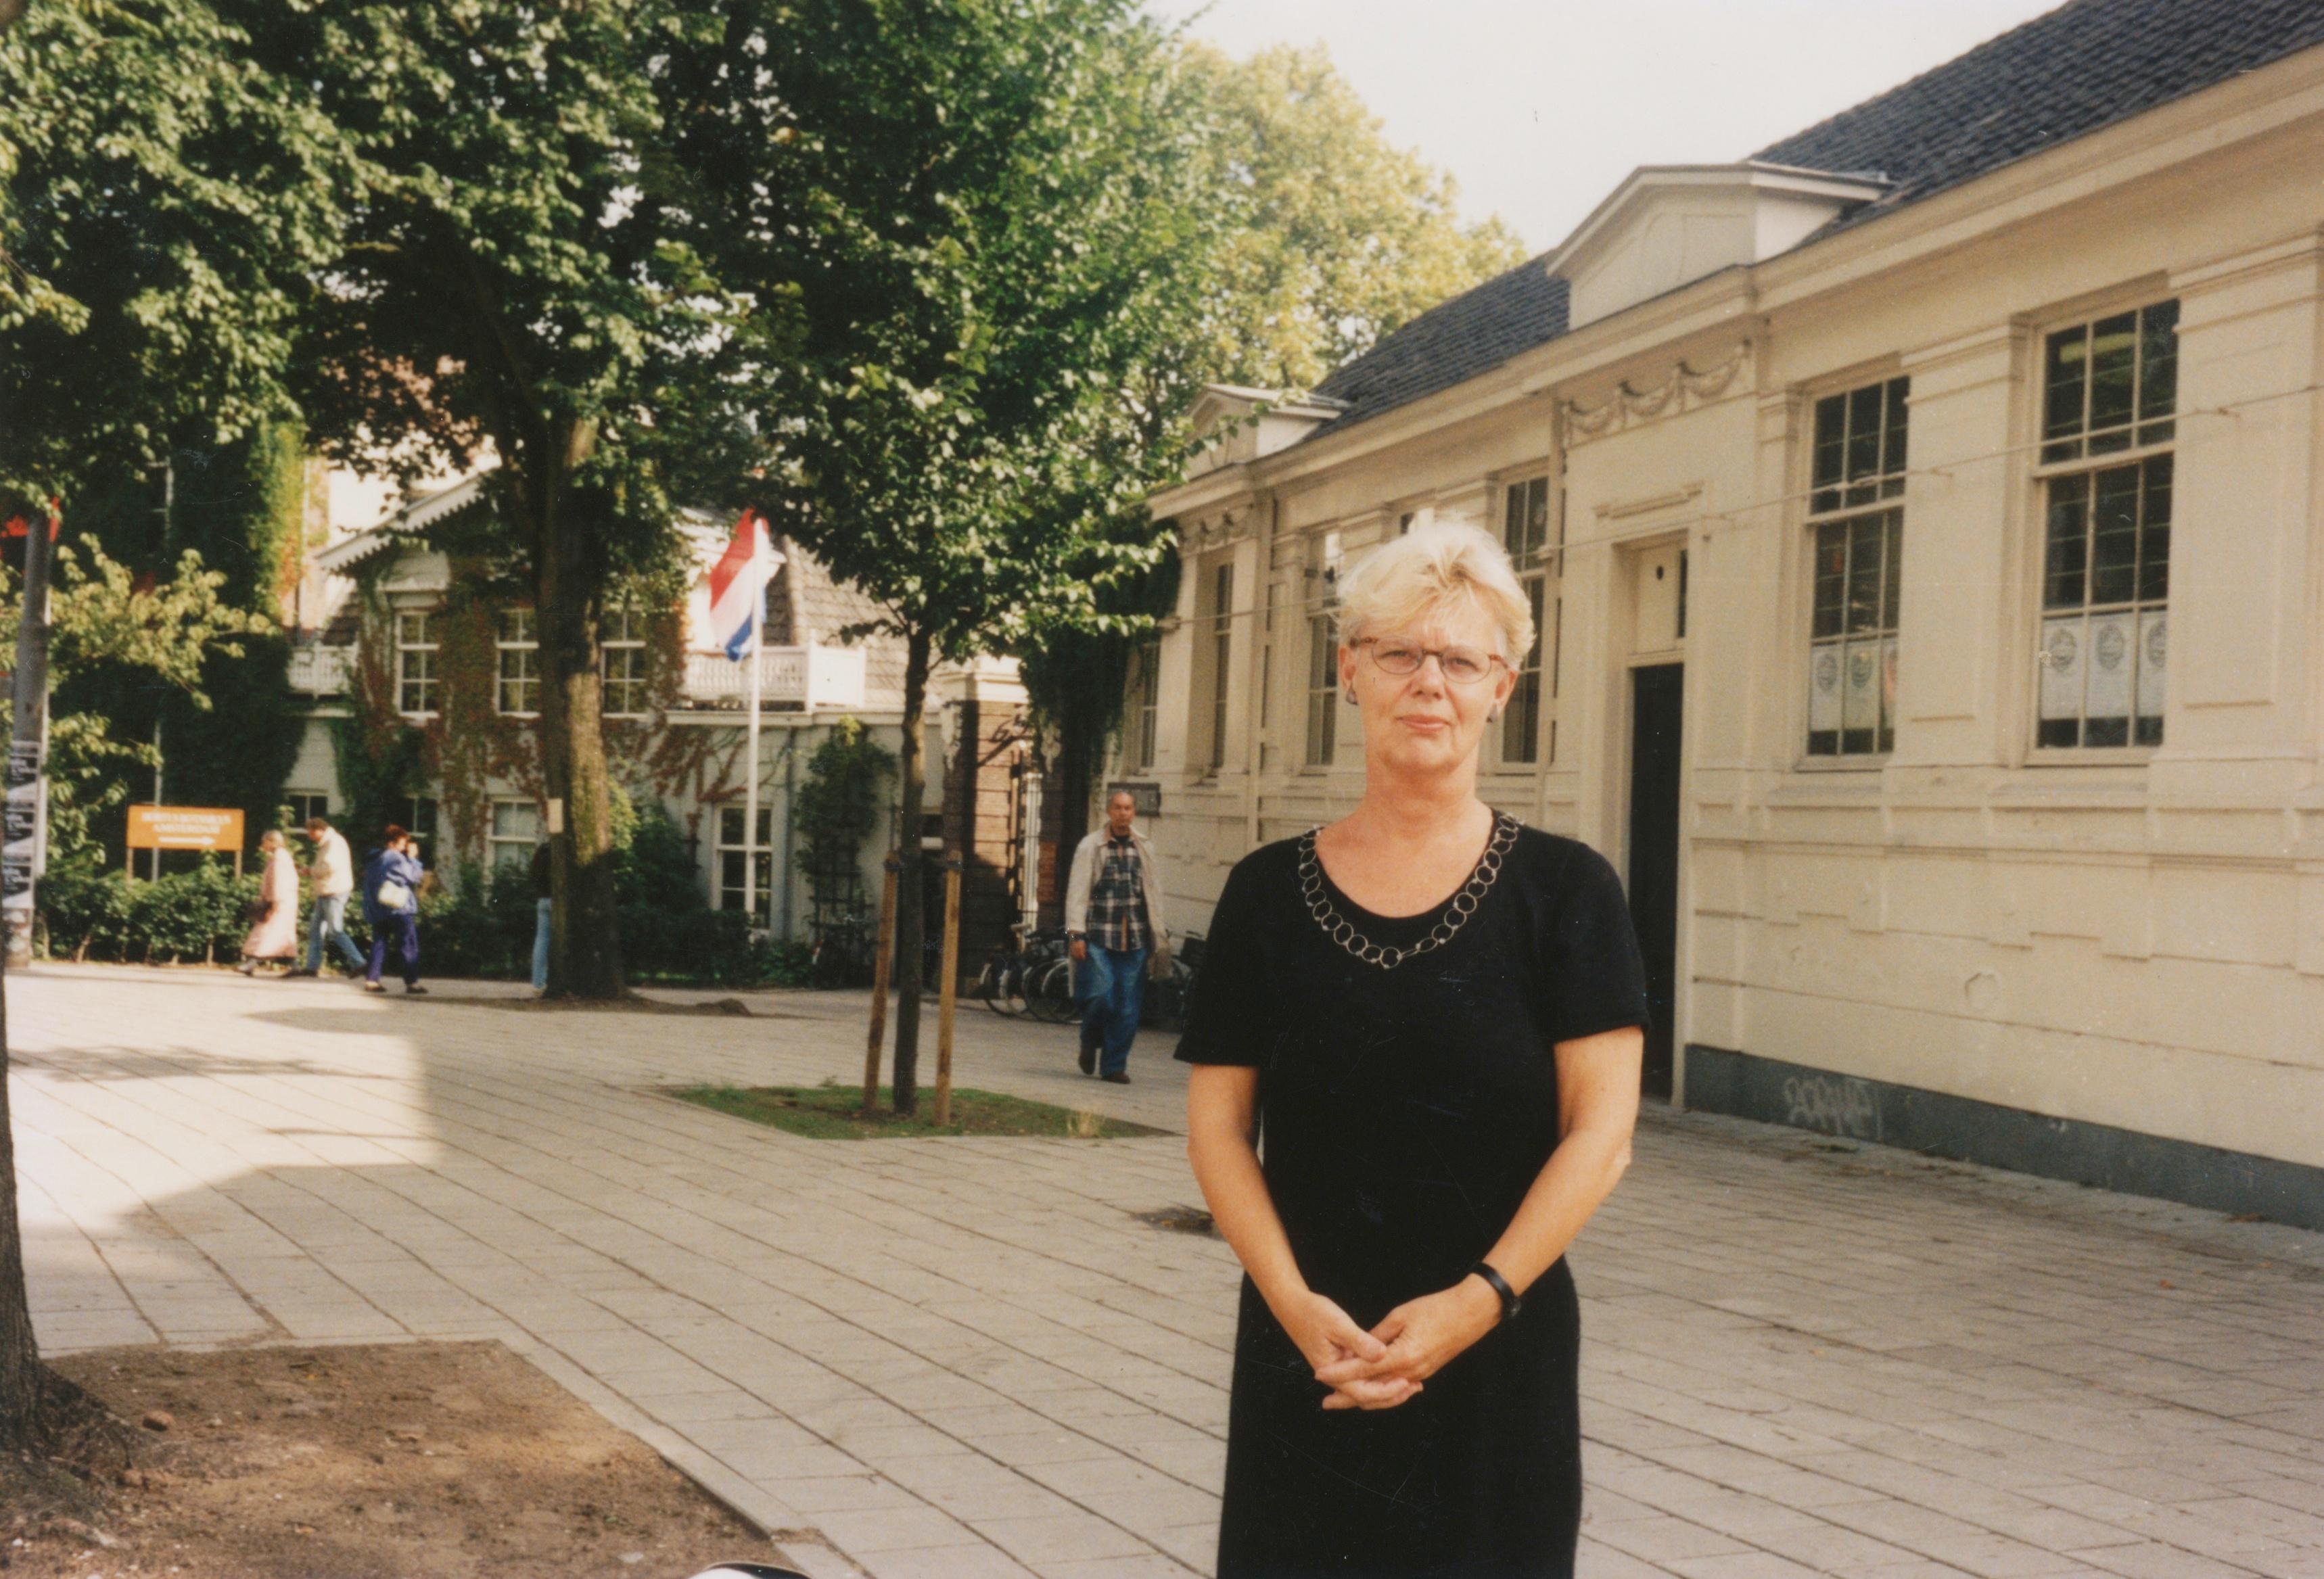 Claartje Keur, Zelfportret met halssieraad van Herman Hermsen, Amsterdam, Hortus Botanicus, 1995. Foto Claartje Keur